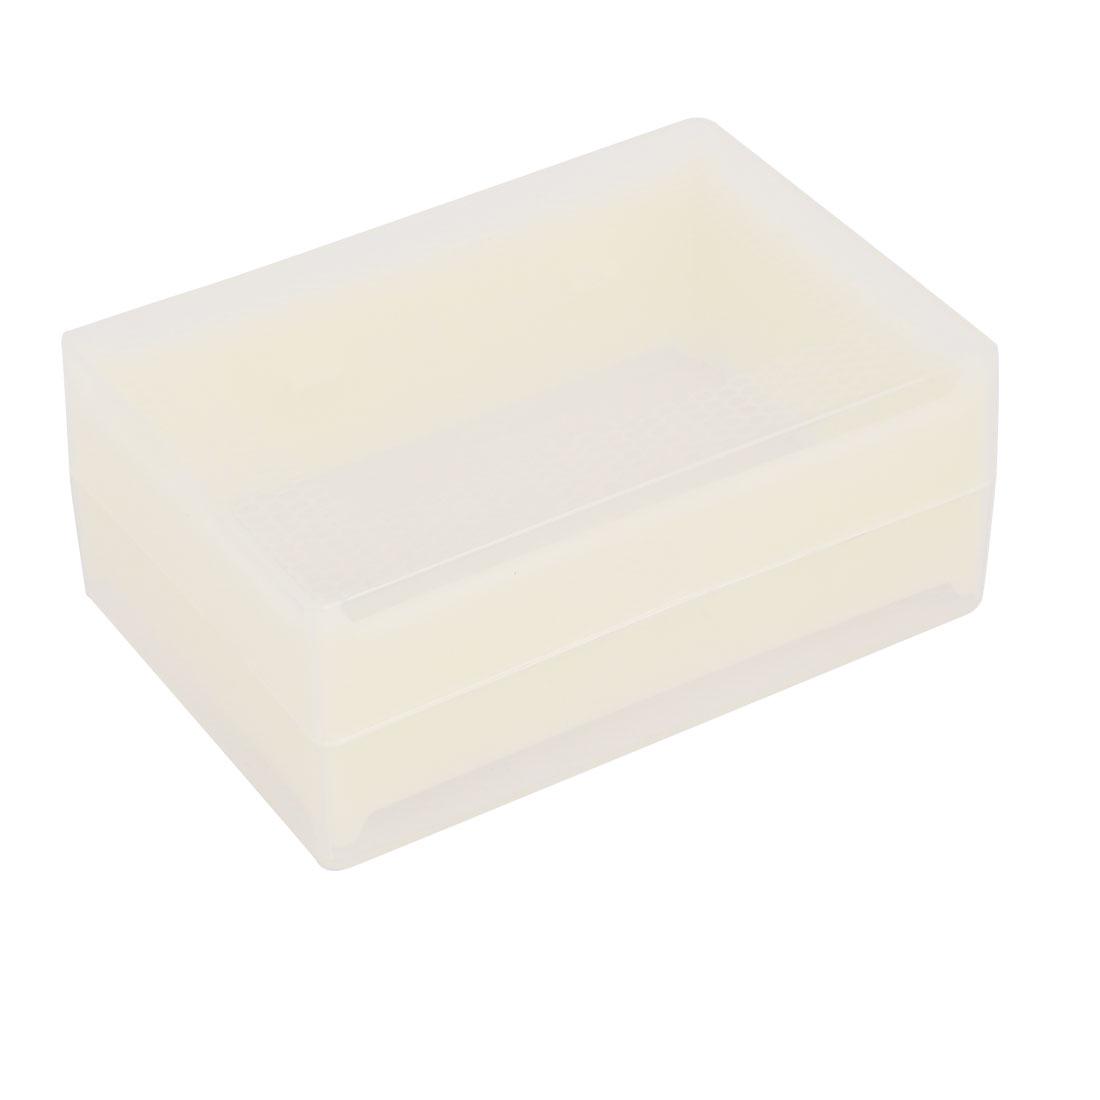 Plastic Beekeeping Tool Honey Lattice Box Bees Produce Mel Hive Case